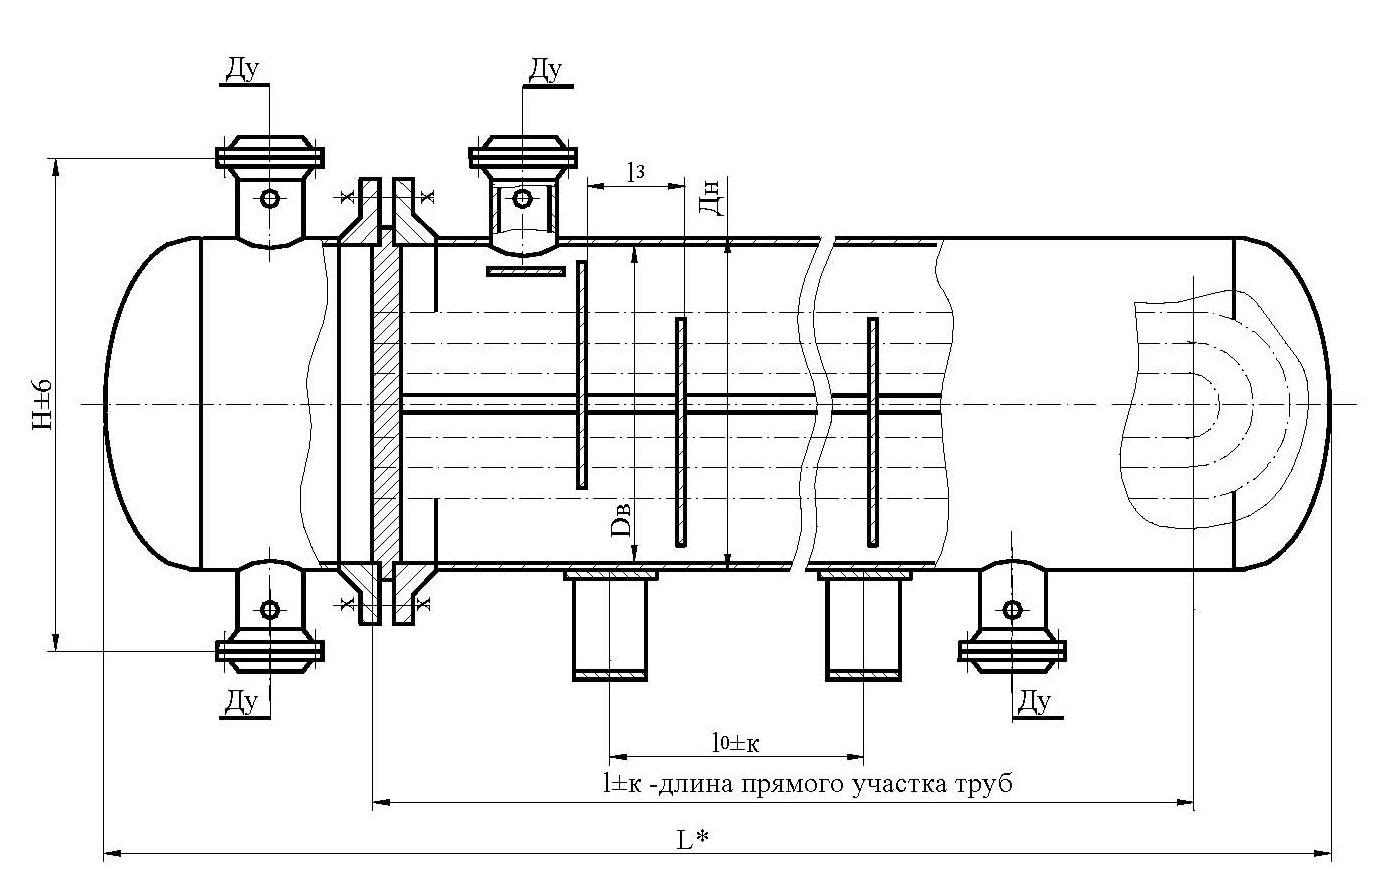 Теплообменник 500тп Уплотнения теплообменника Этра ЭТ-081 Кызыл